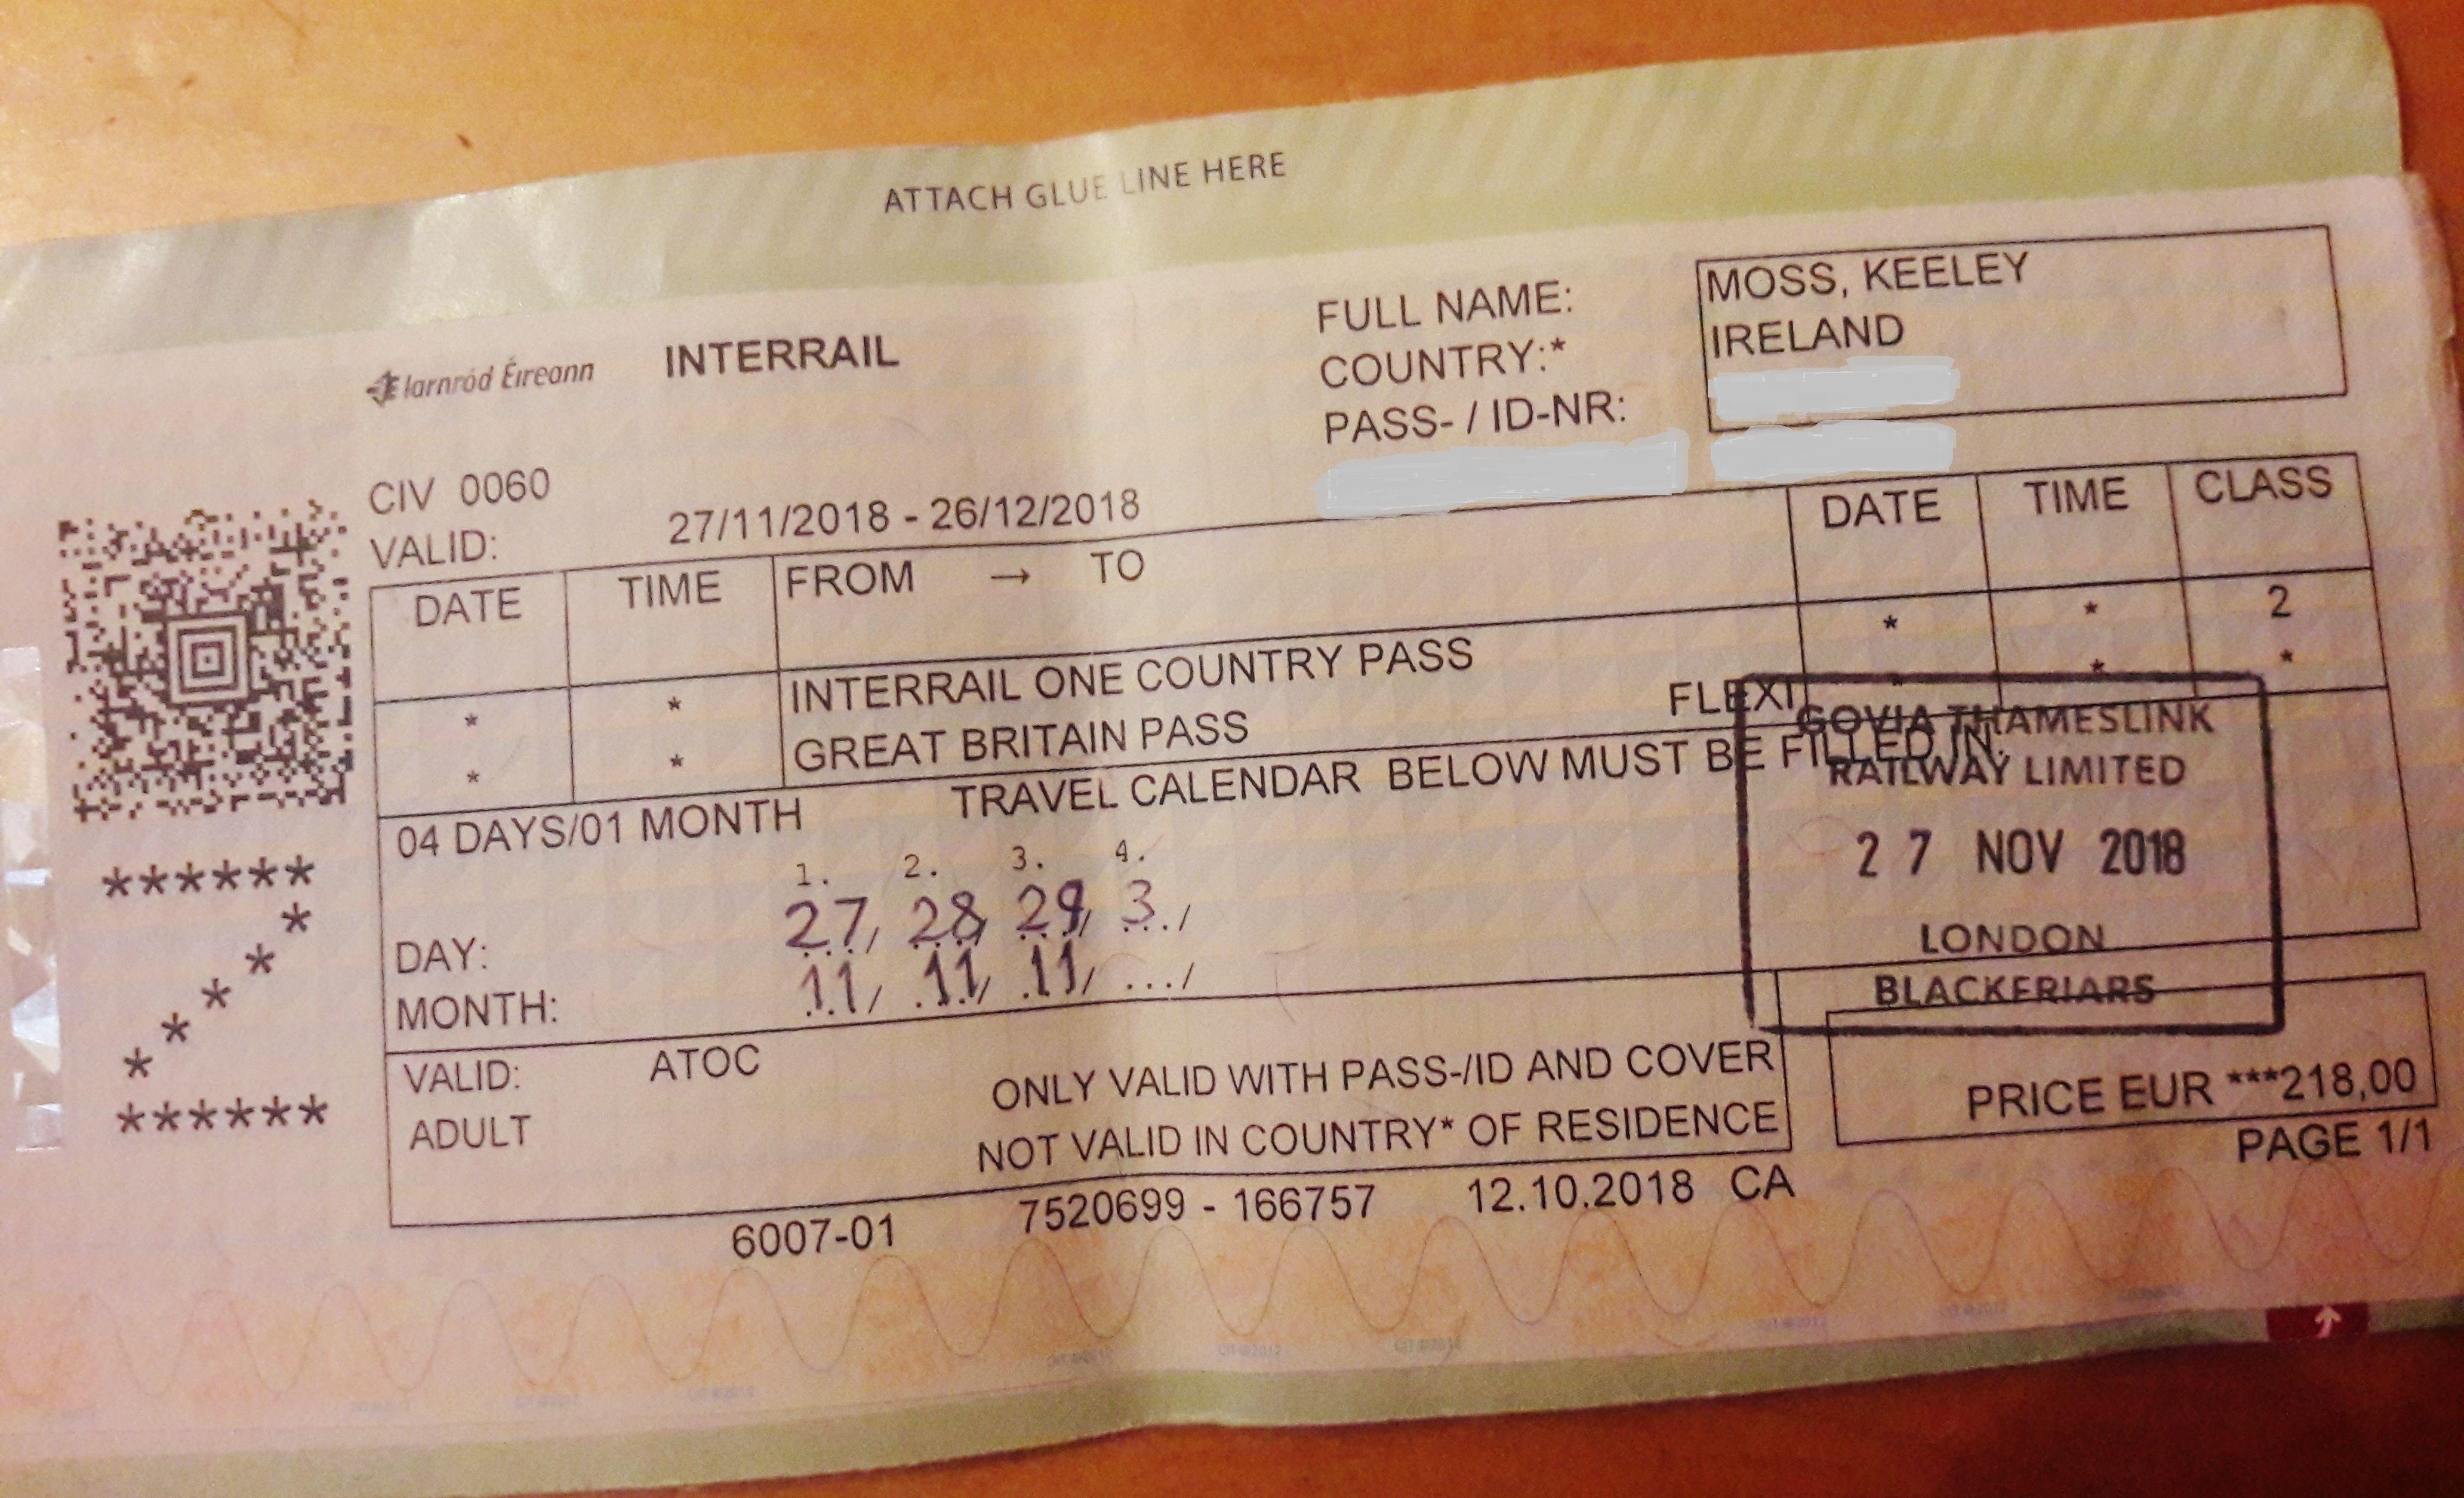 Keeley Interrail ticket